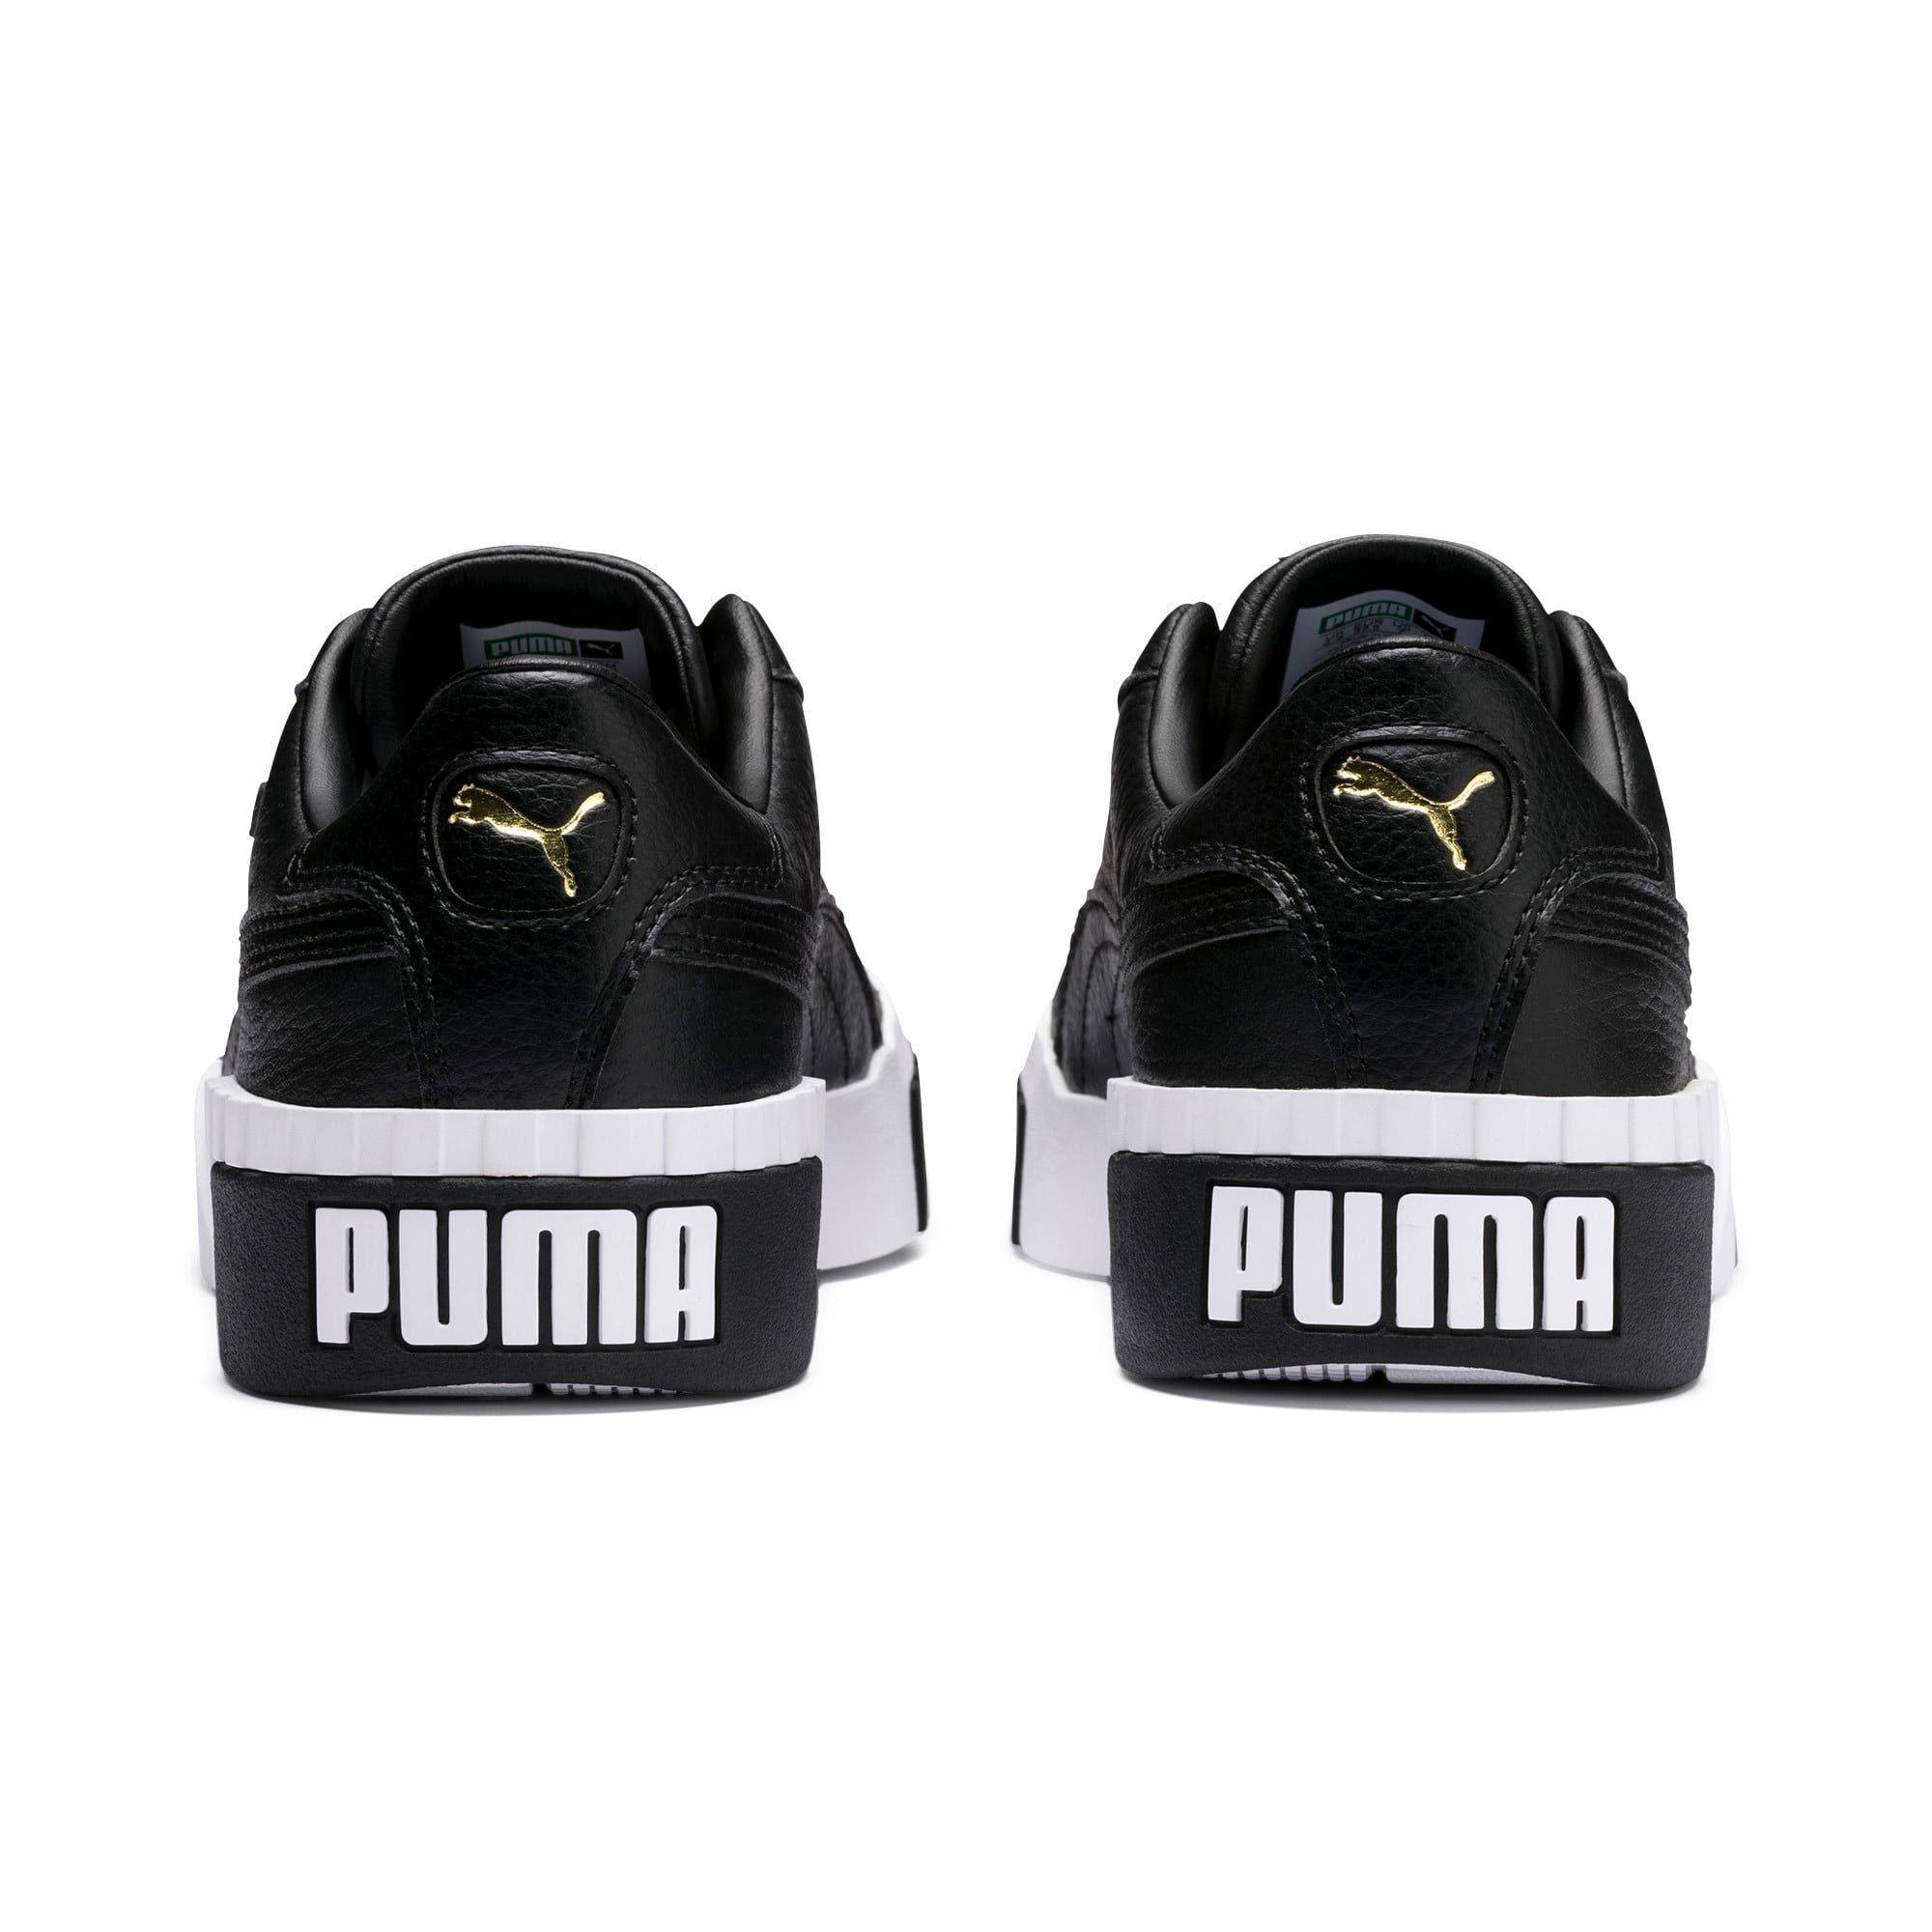 Puma Cali Women S Trainers In Black White Size 6 5 Shoegame Womens Sneakers Trainers Women Puma Cali